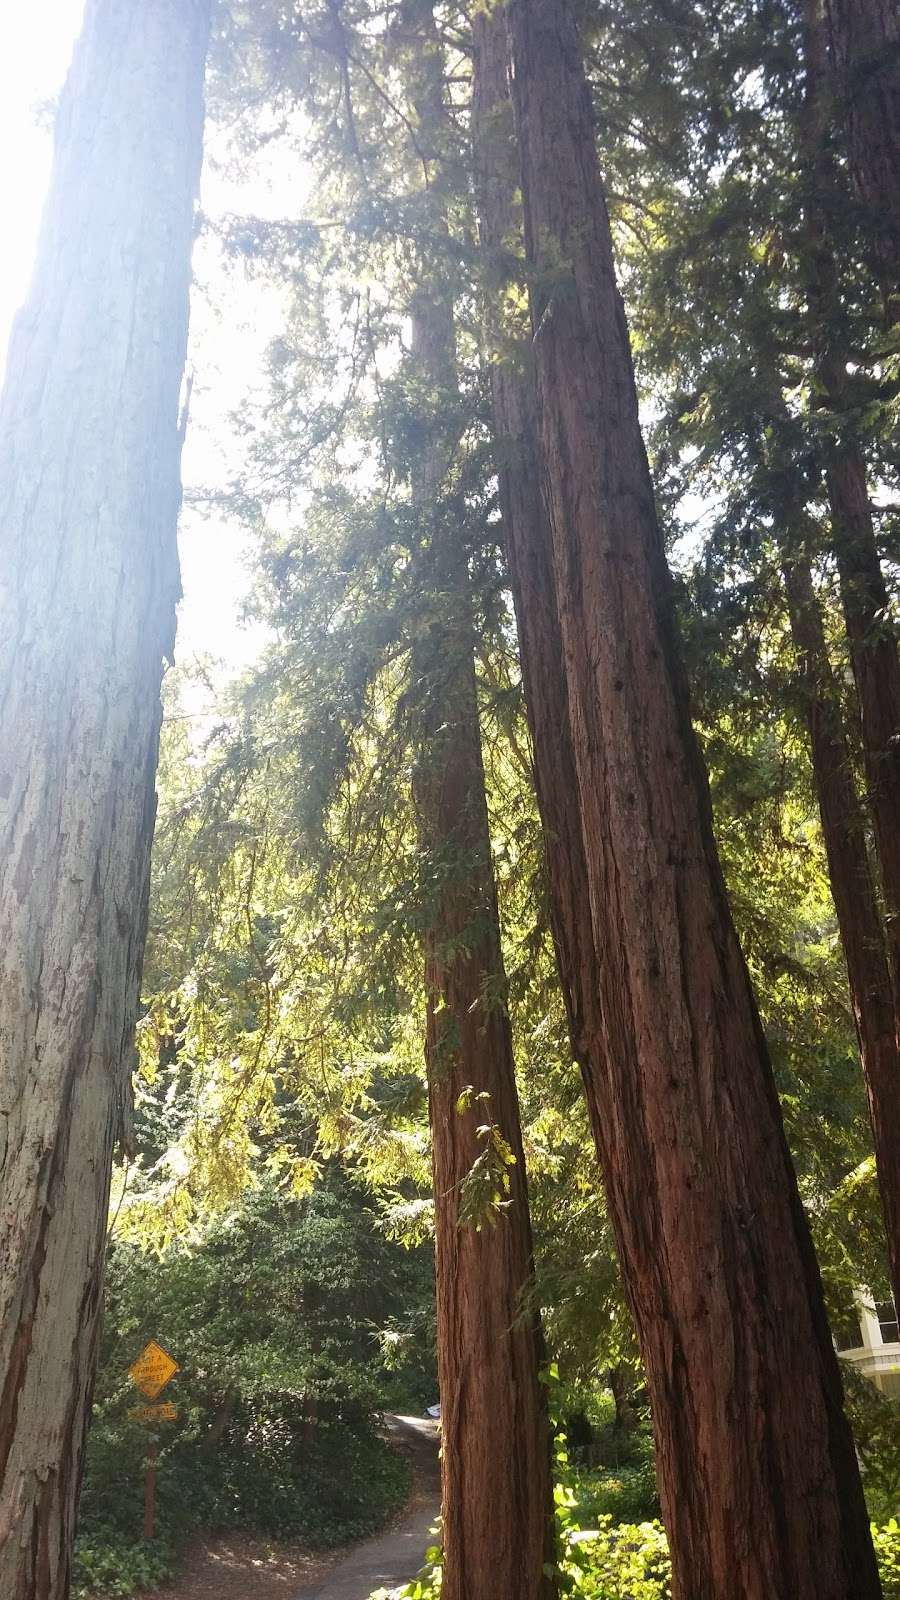 Forest Springs Improvement & Maintenance - park  | Photo 4 of 5 | Address: 401 Acorn Dr, Boulder Creek, CA 95006, USA | Phone: (831) 338-7134